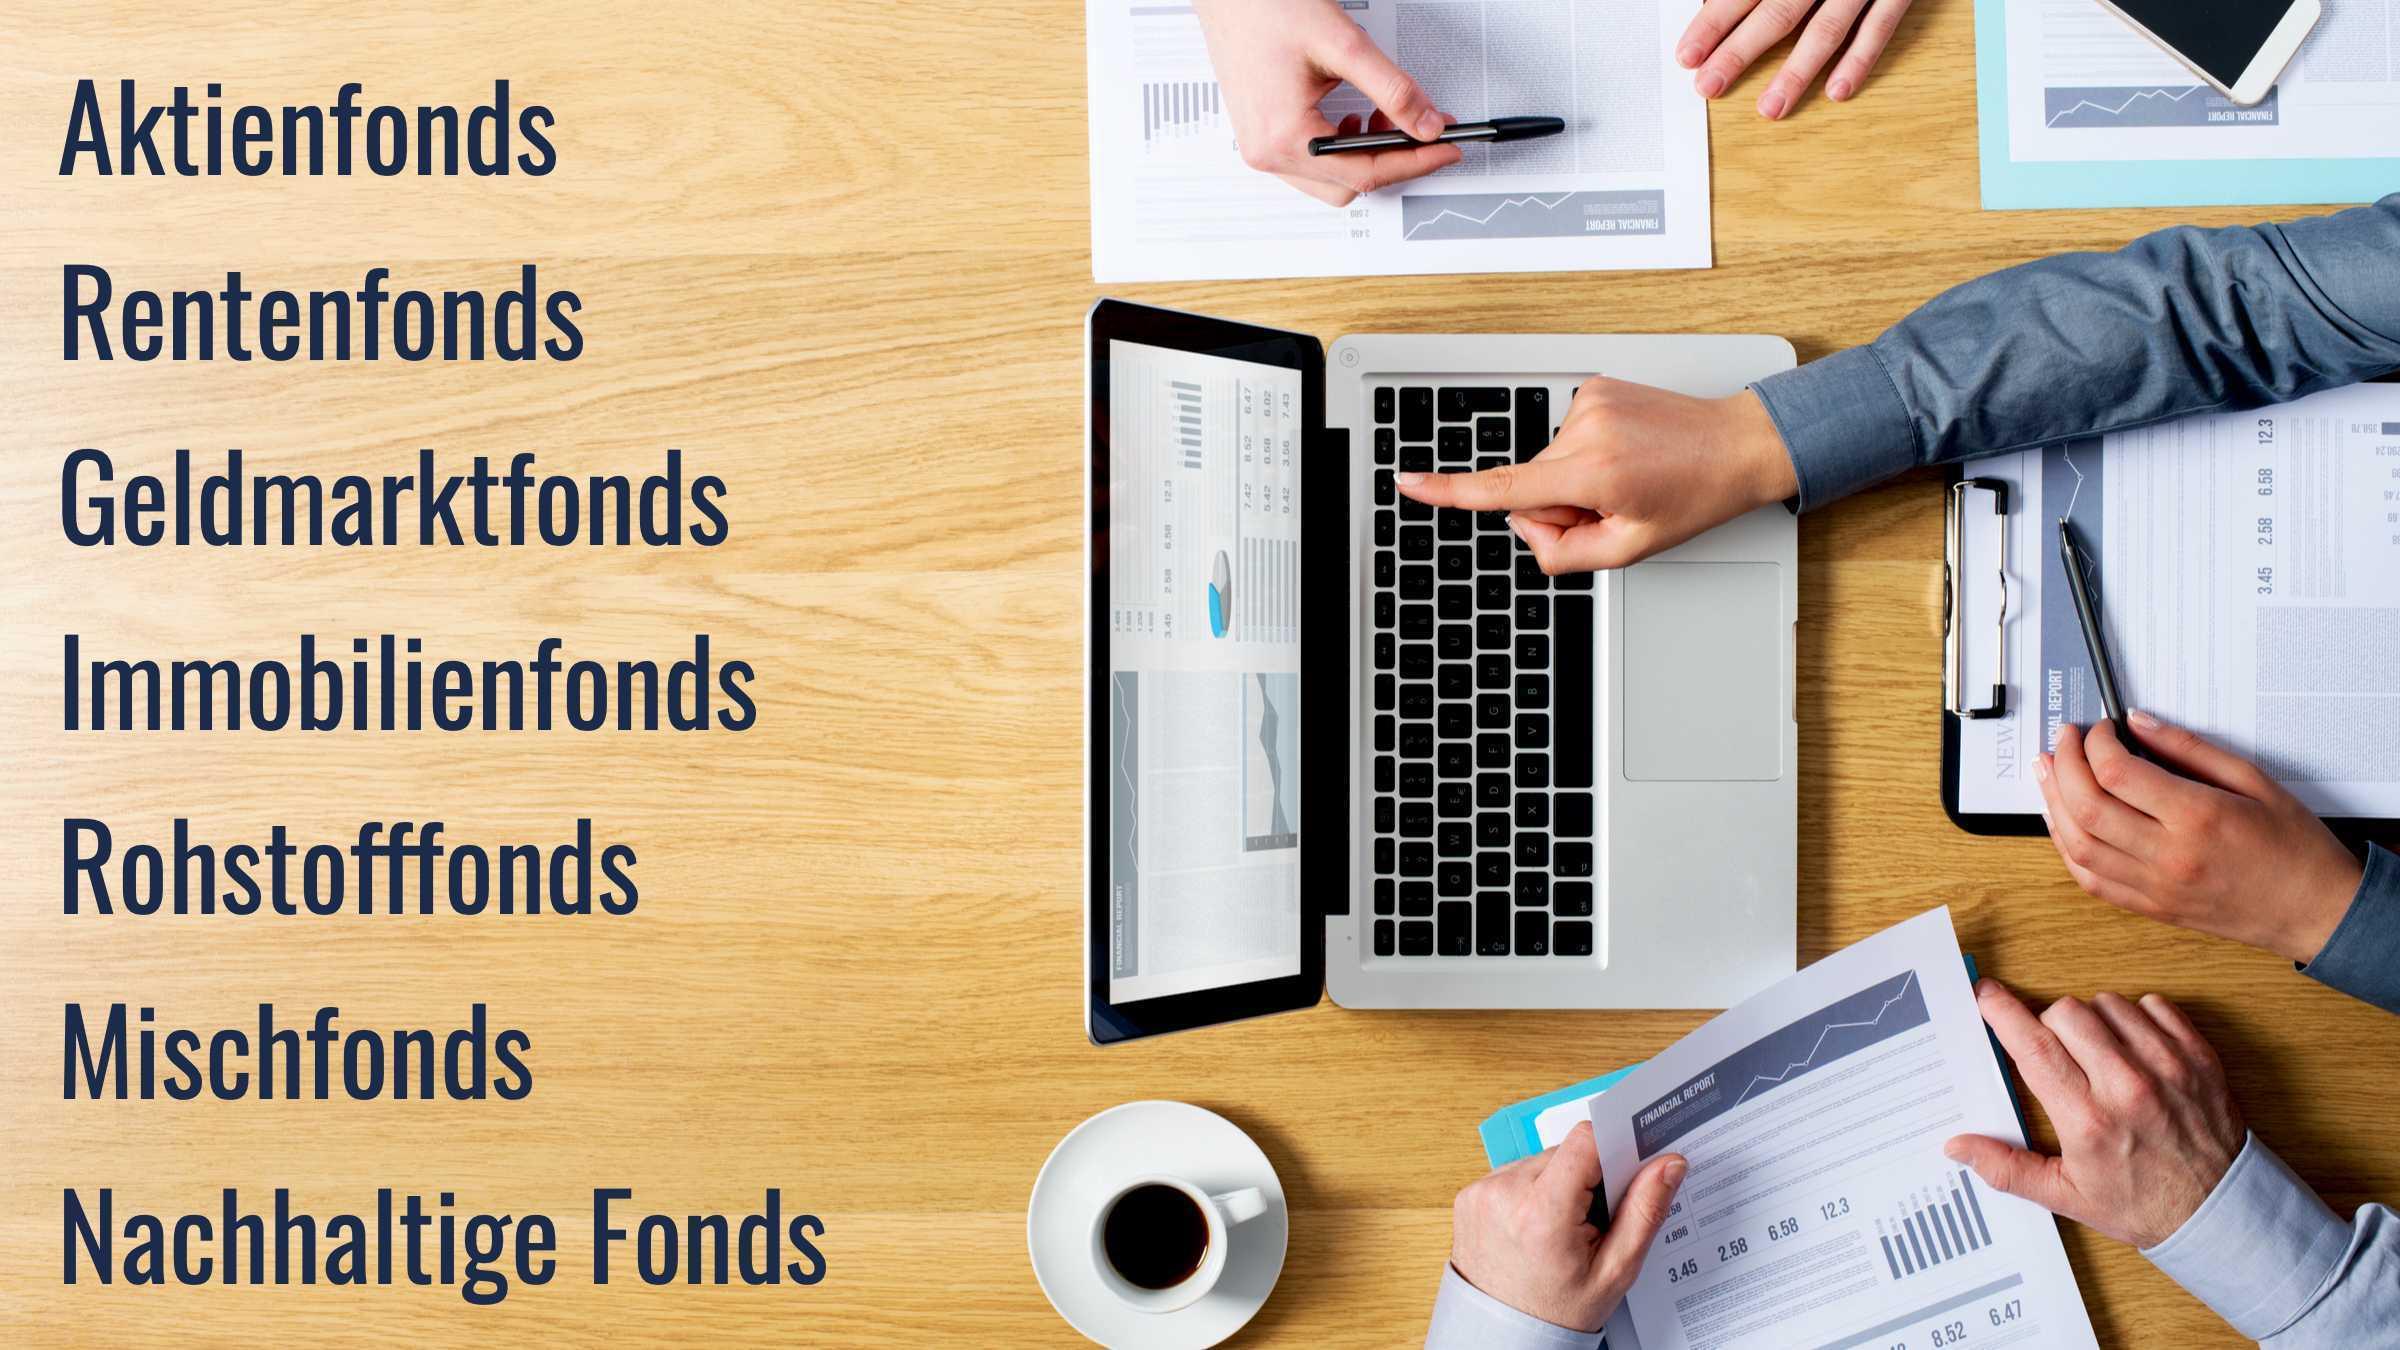 Fondskategorien